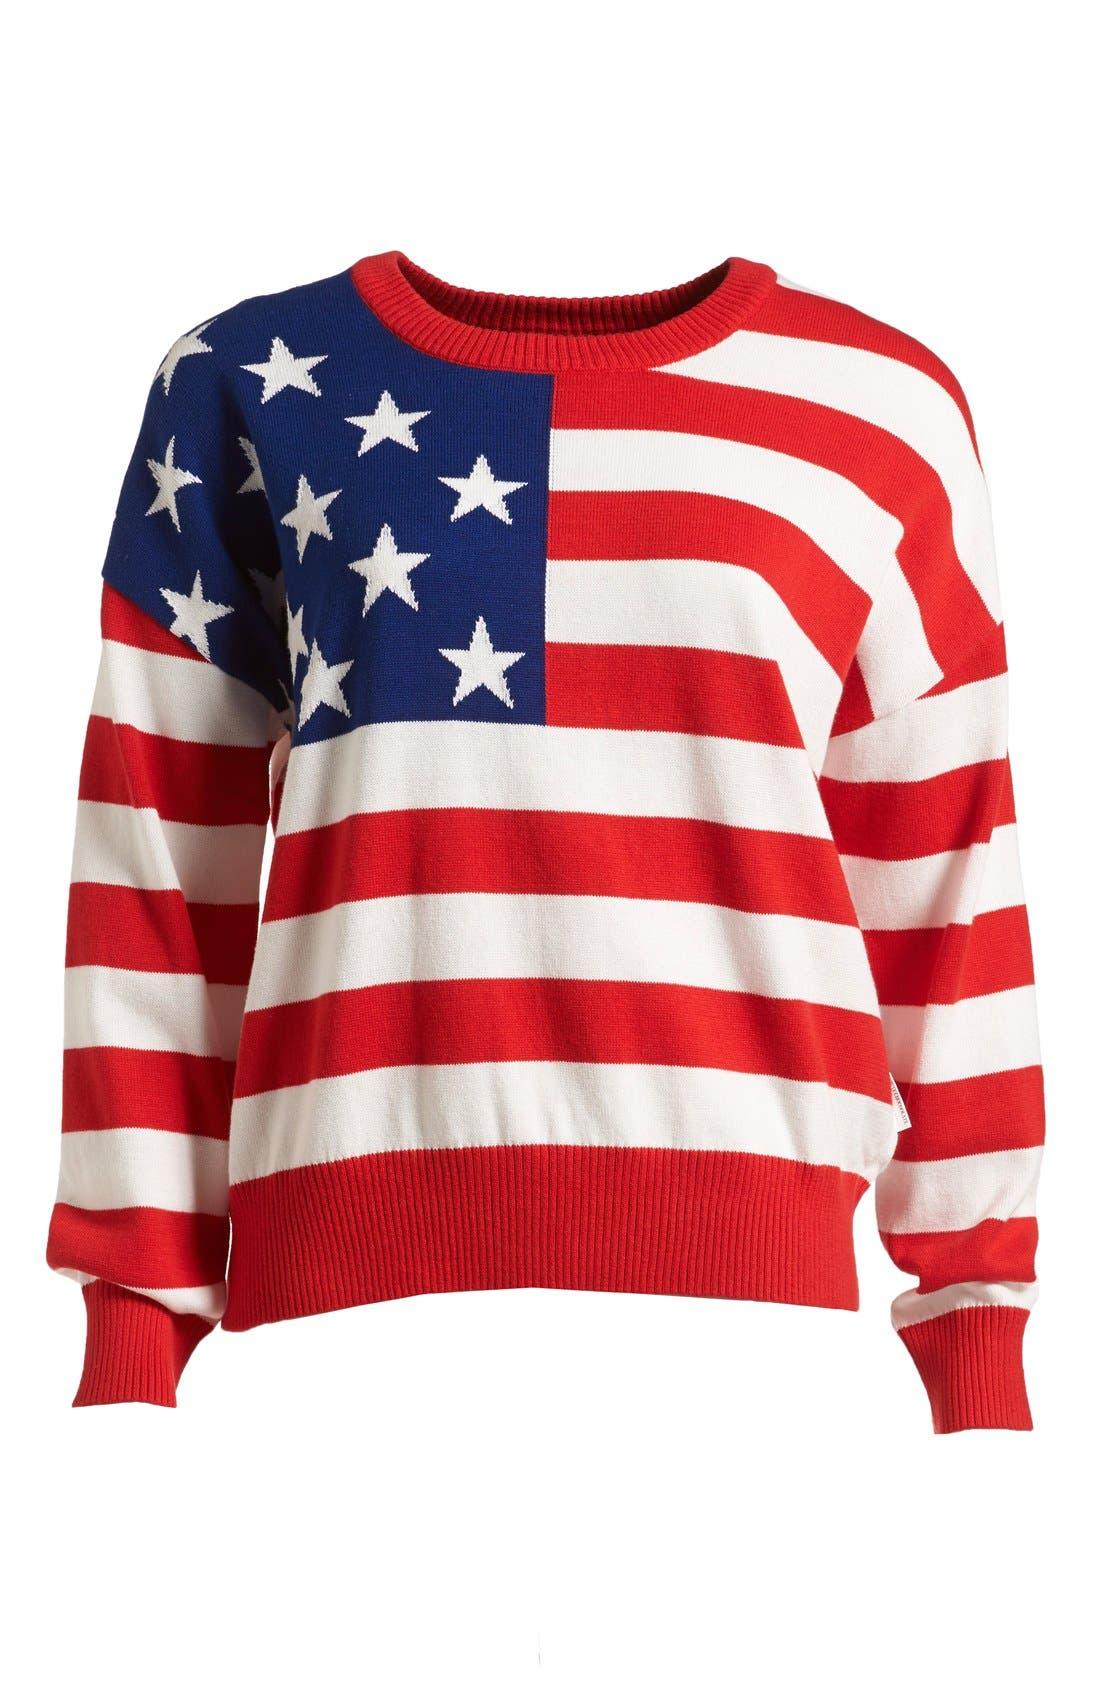 Alternate Image 1 Selected - :CHOCOOLATE US Flag Knit Sweater (Women)